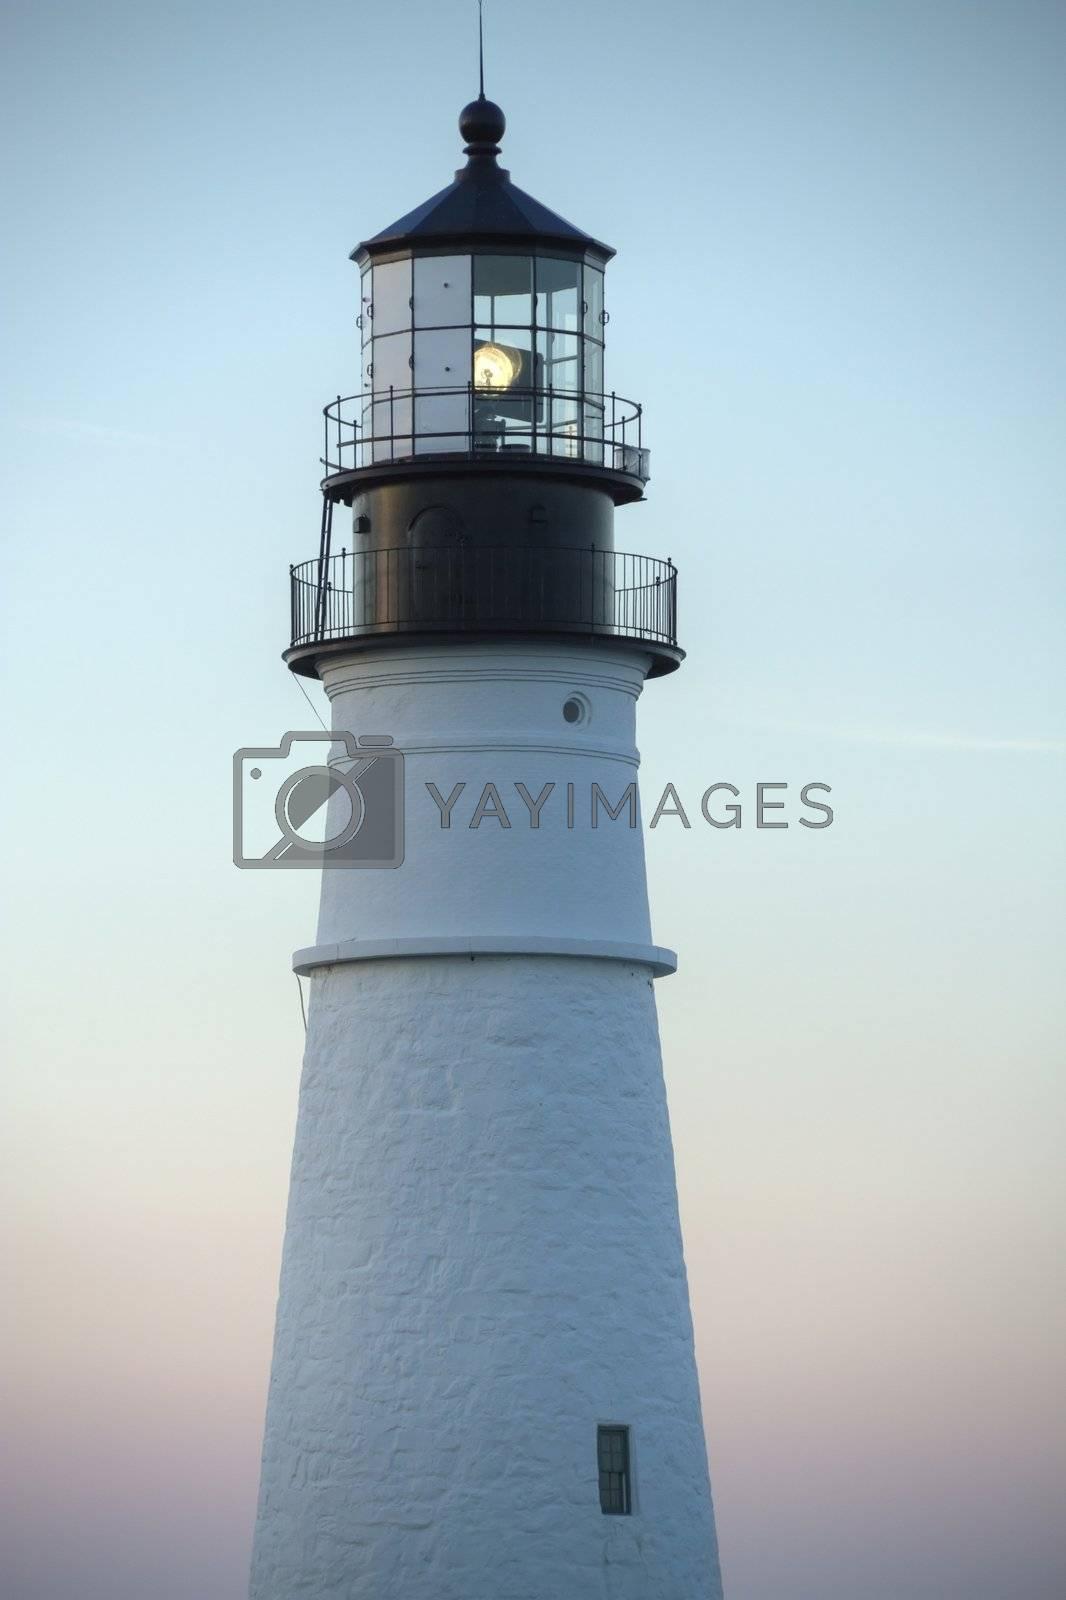 Royalty free image of Beacon by jasony00